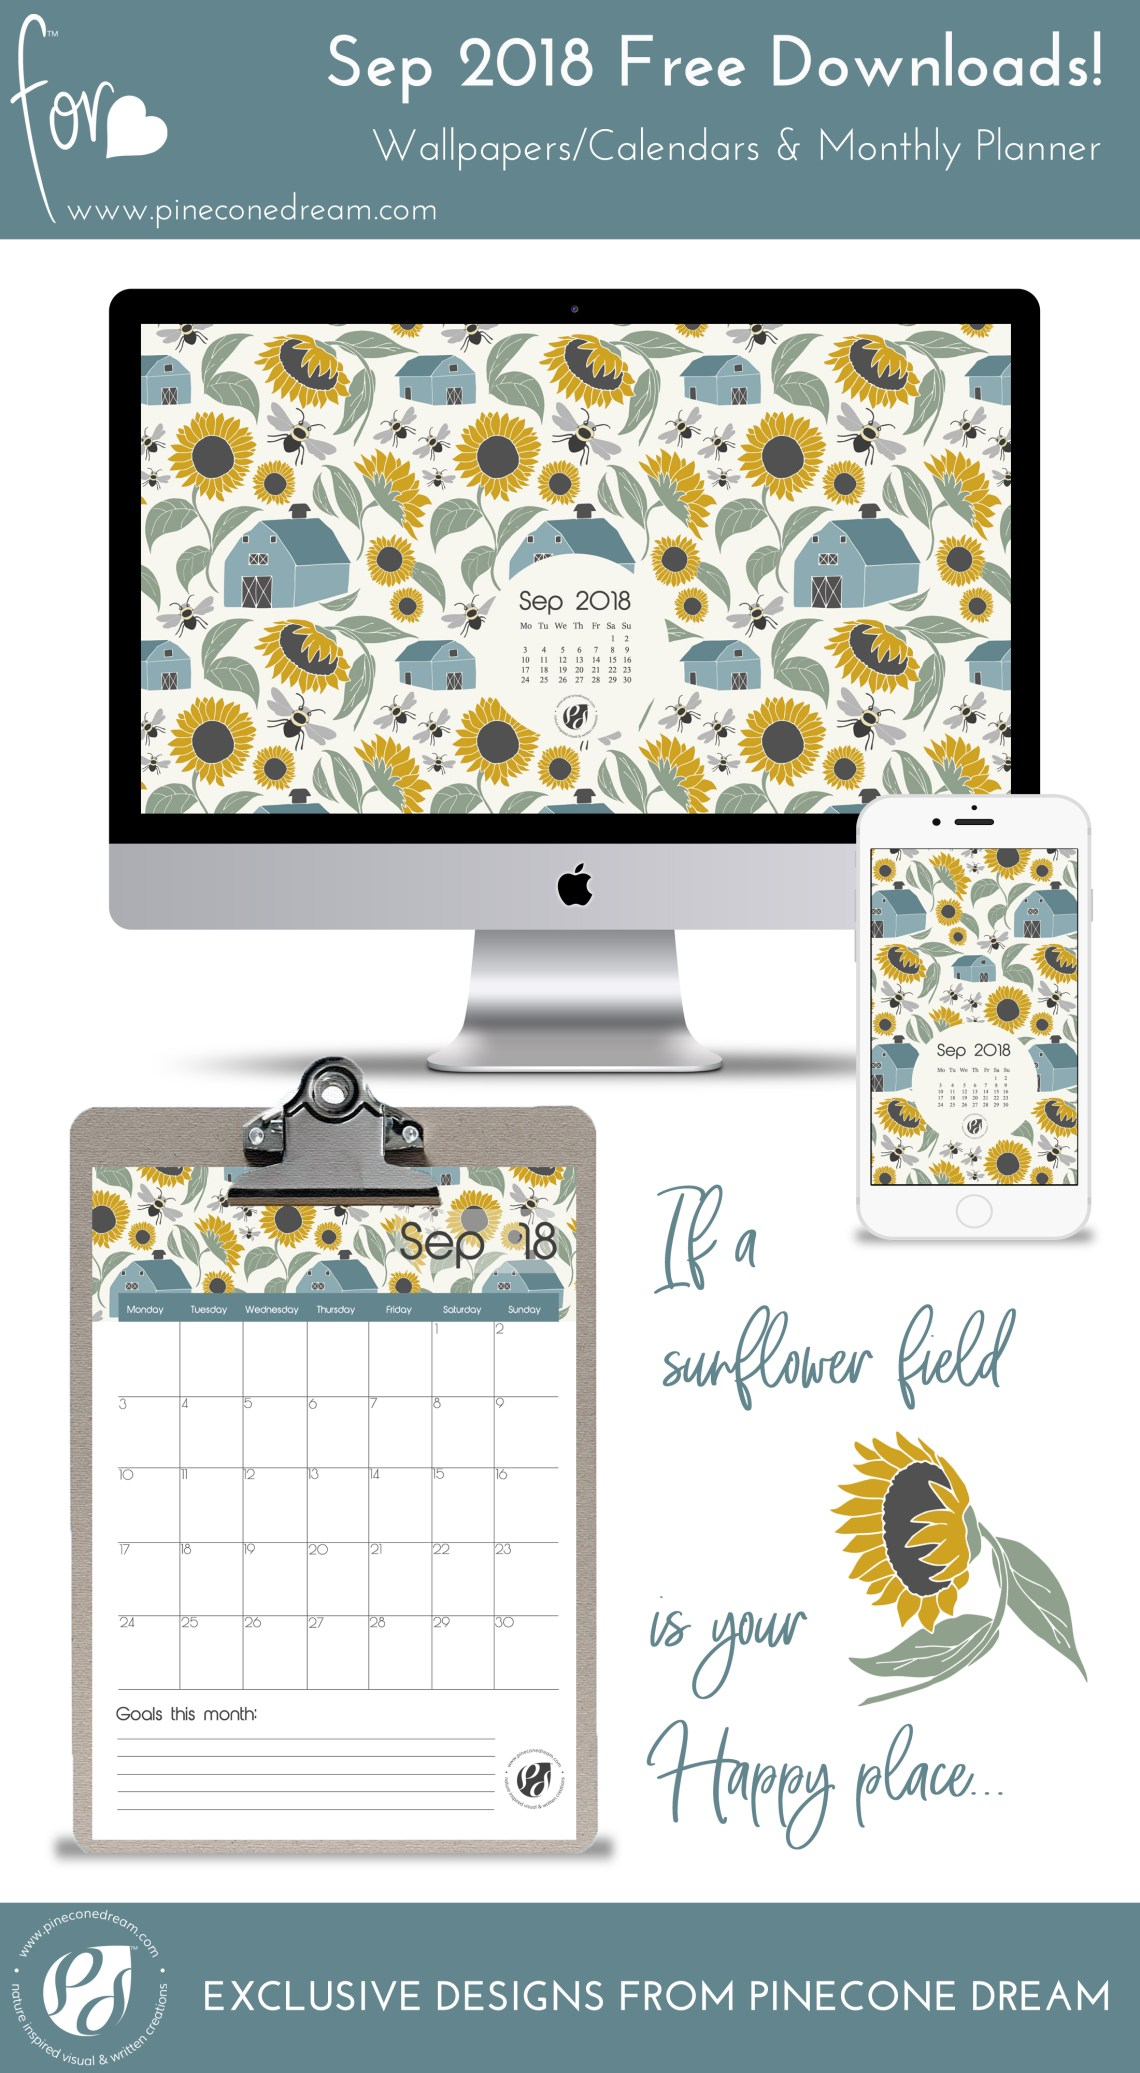 Sep_2018_calendarwallpapers_Pineconedream